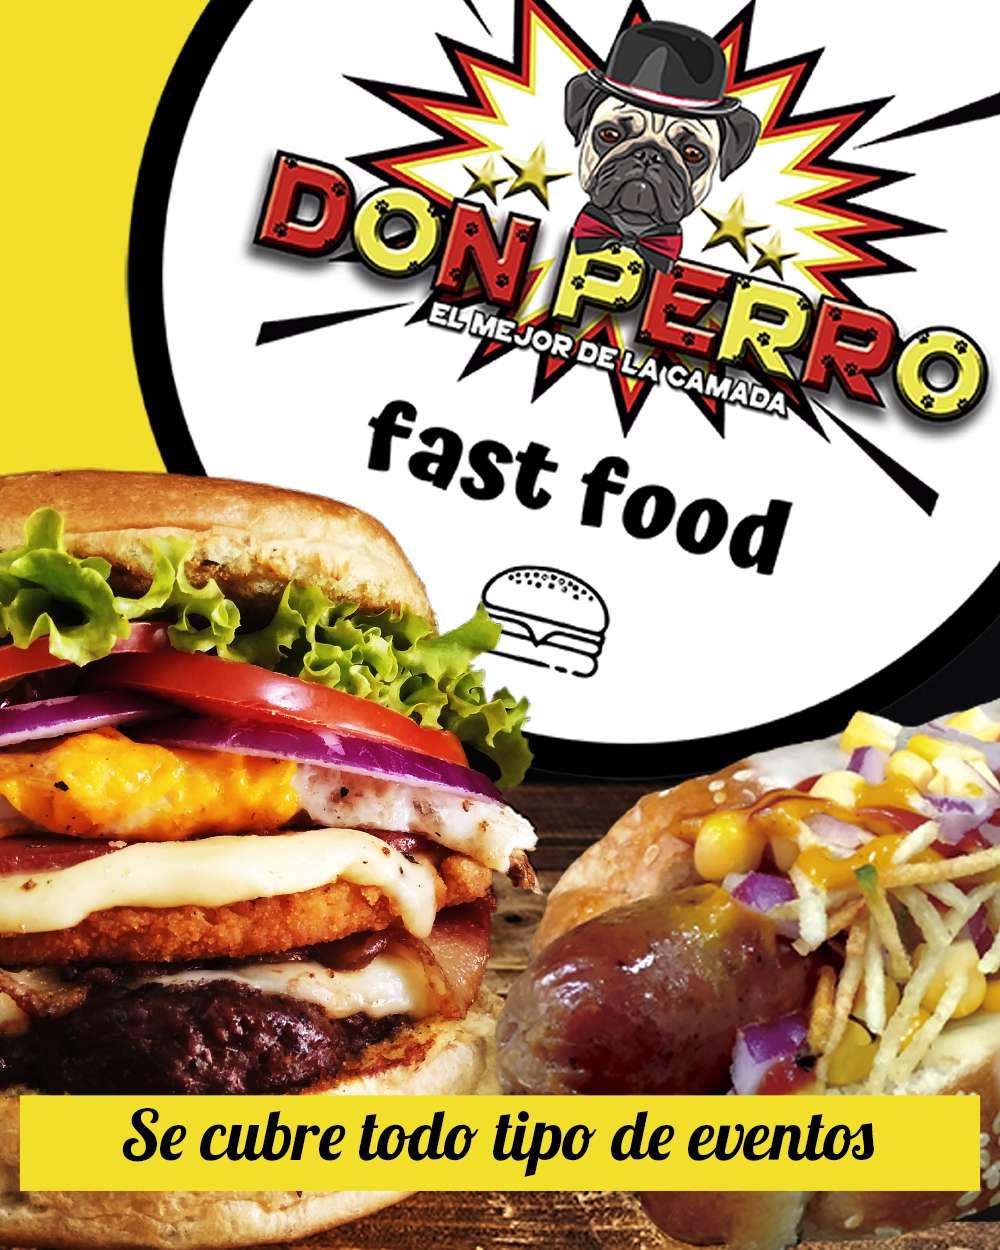 Don Perro Fast Food